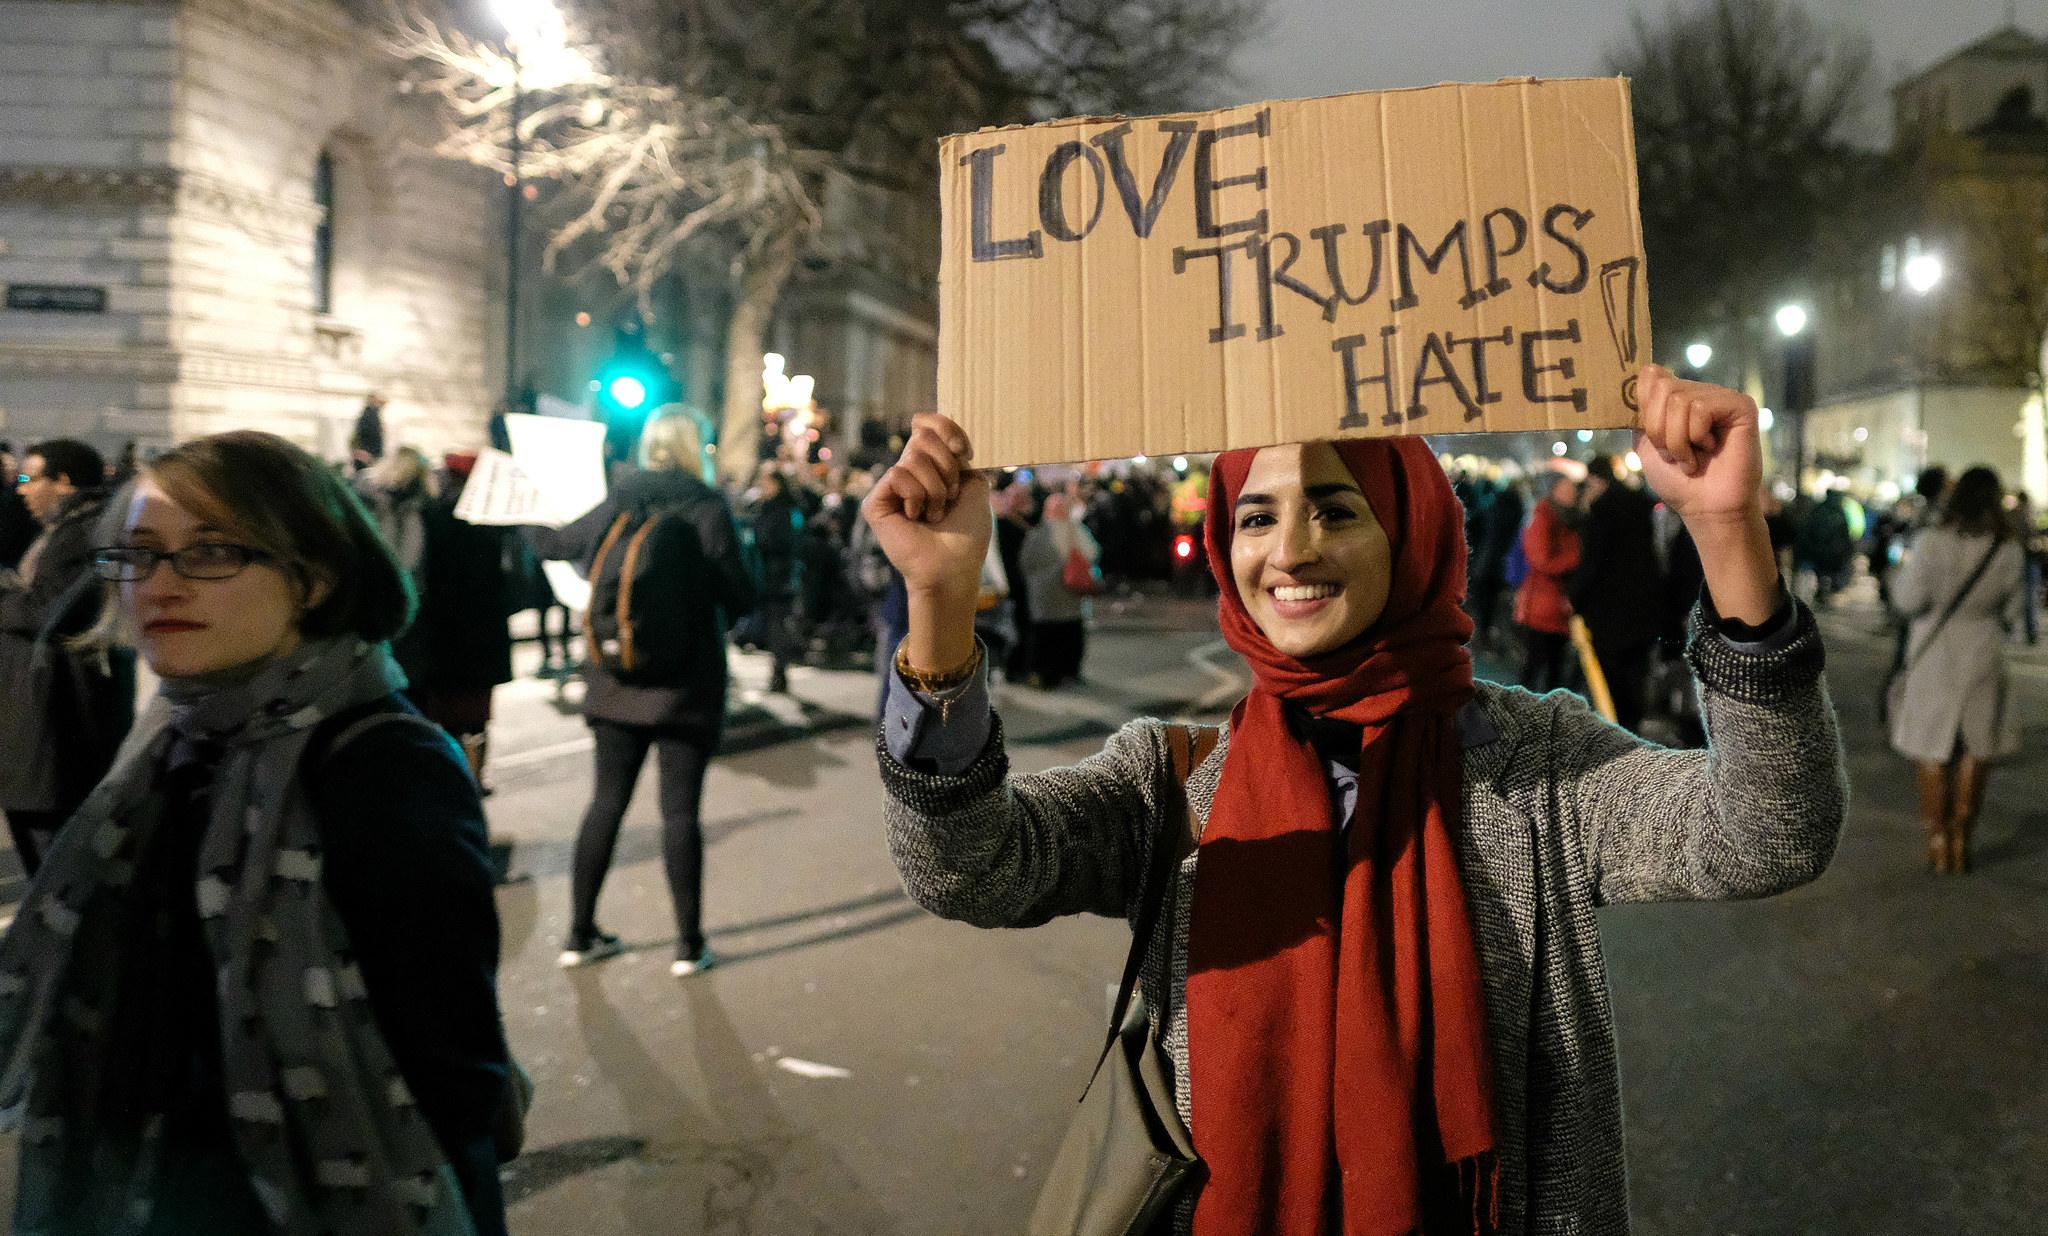 x-1Banner-Love Trumps Hate-Alisdare Hickson.jpg